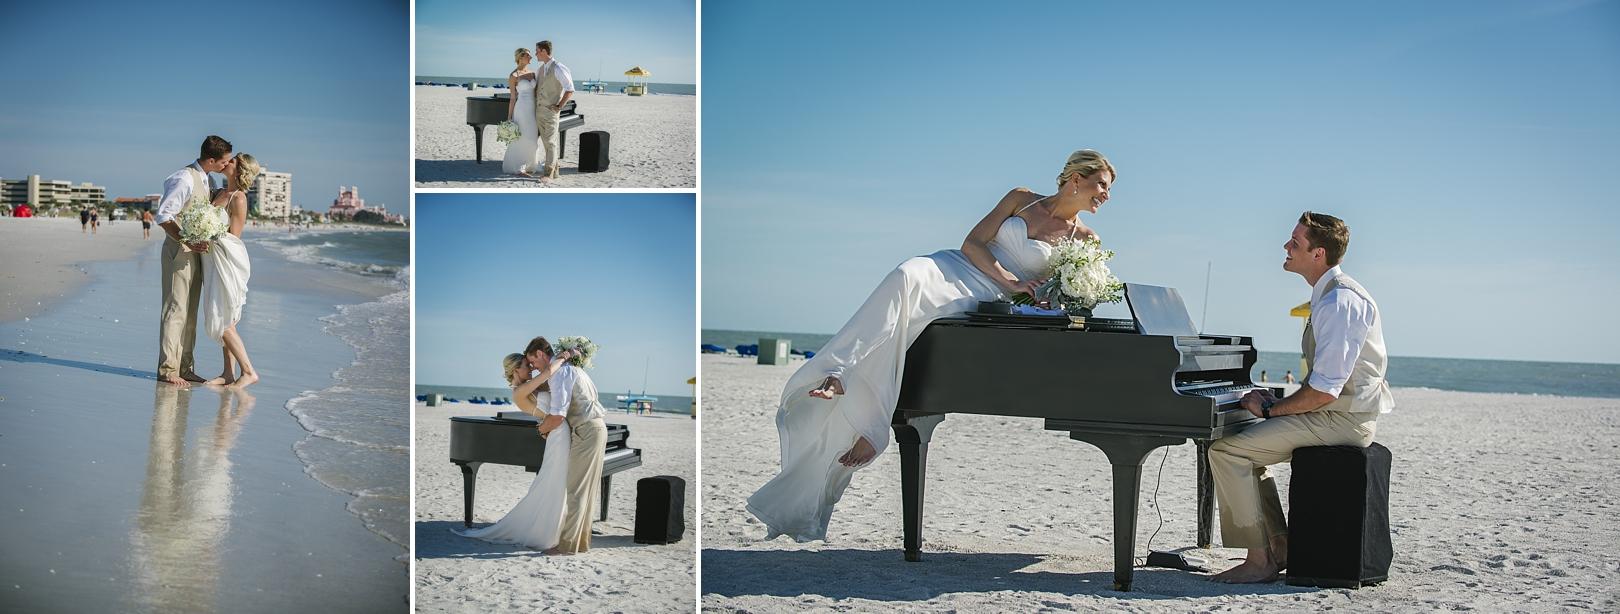 baby grand piano on the beach sirata beach wedding photos